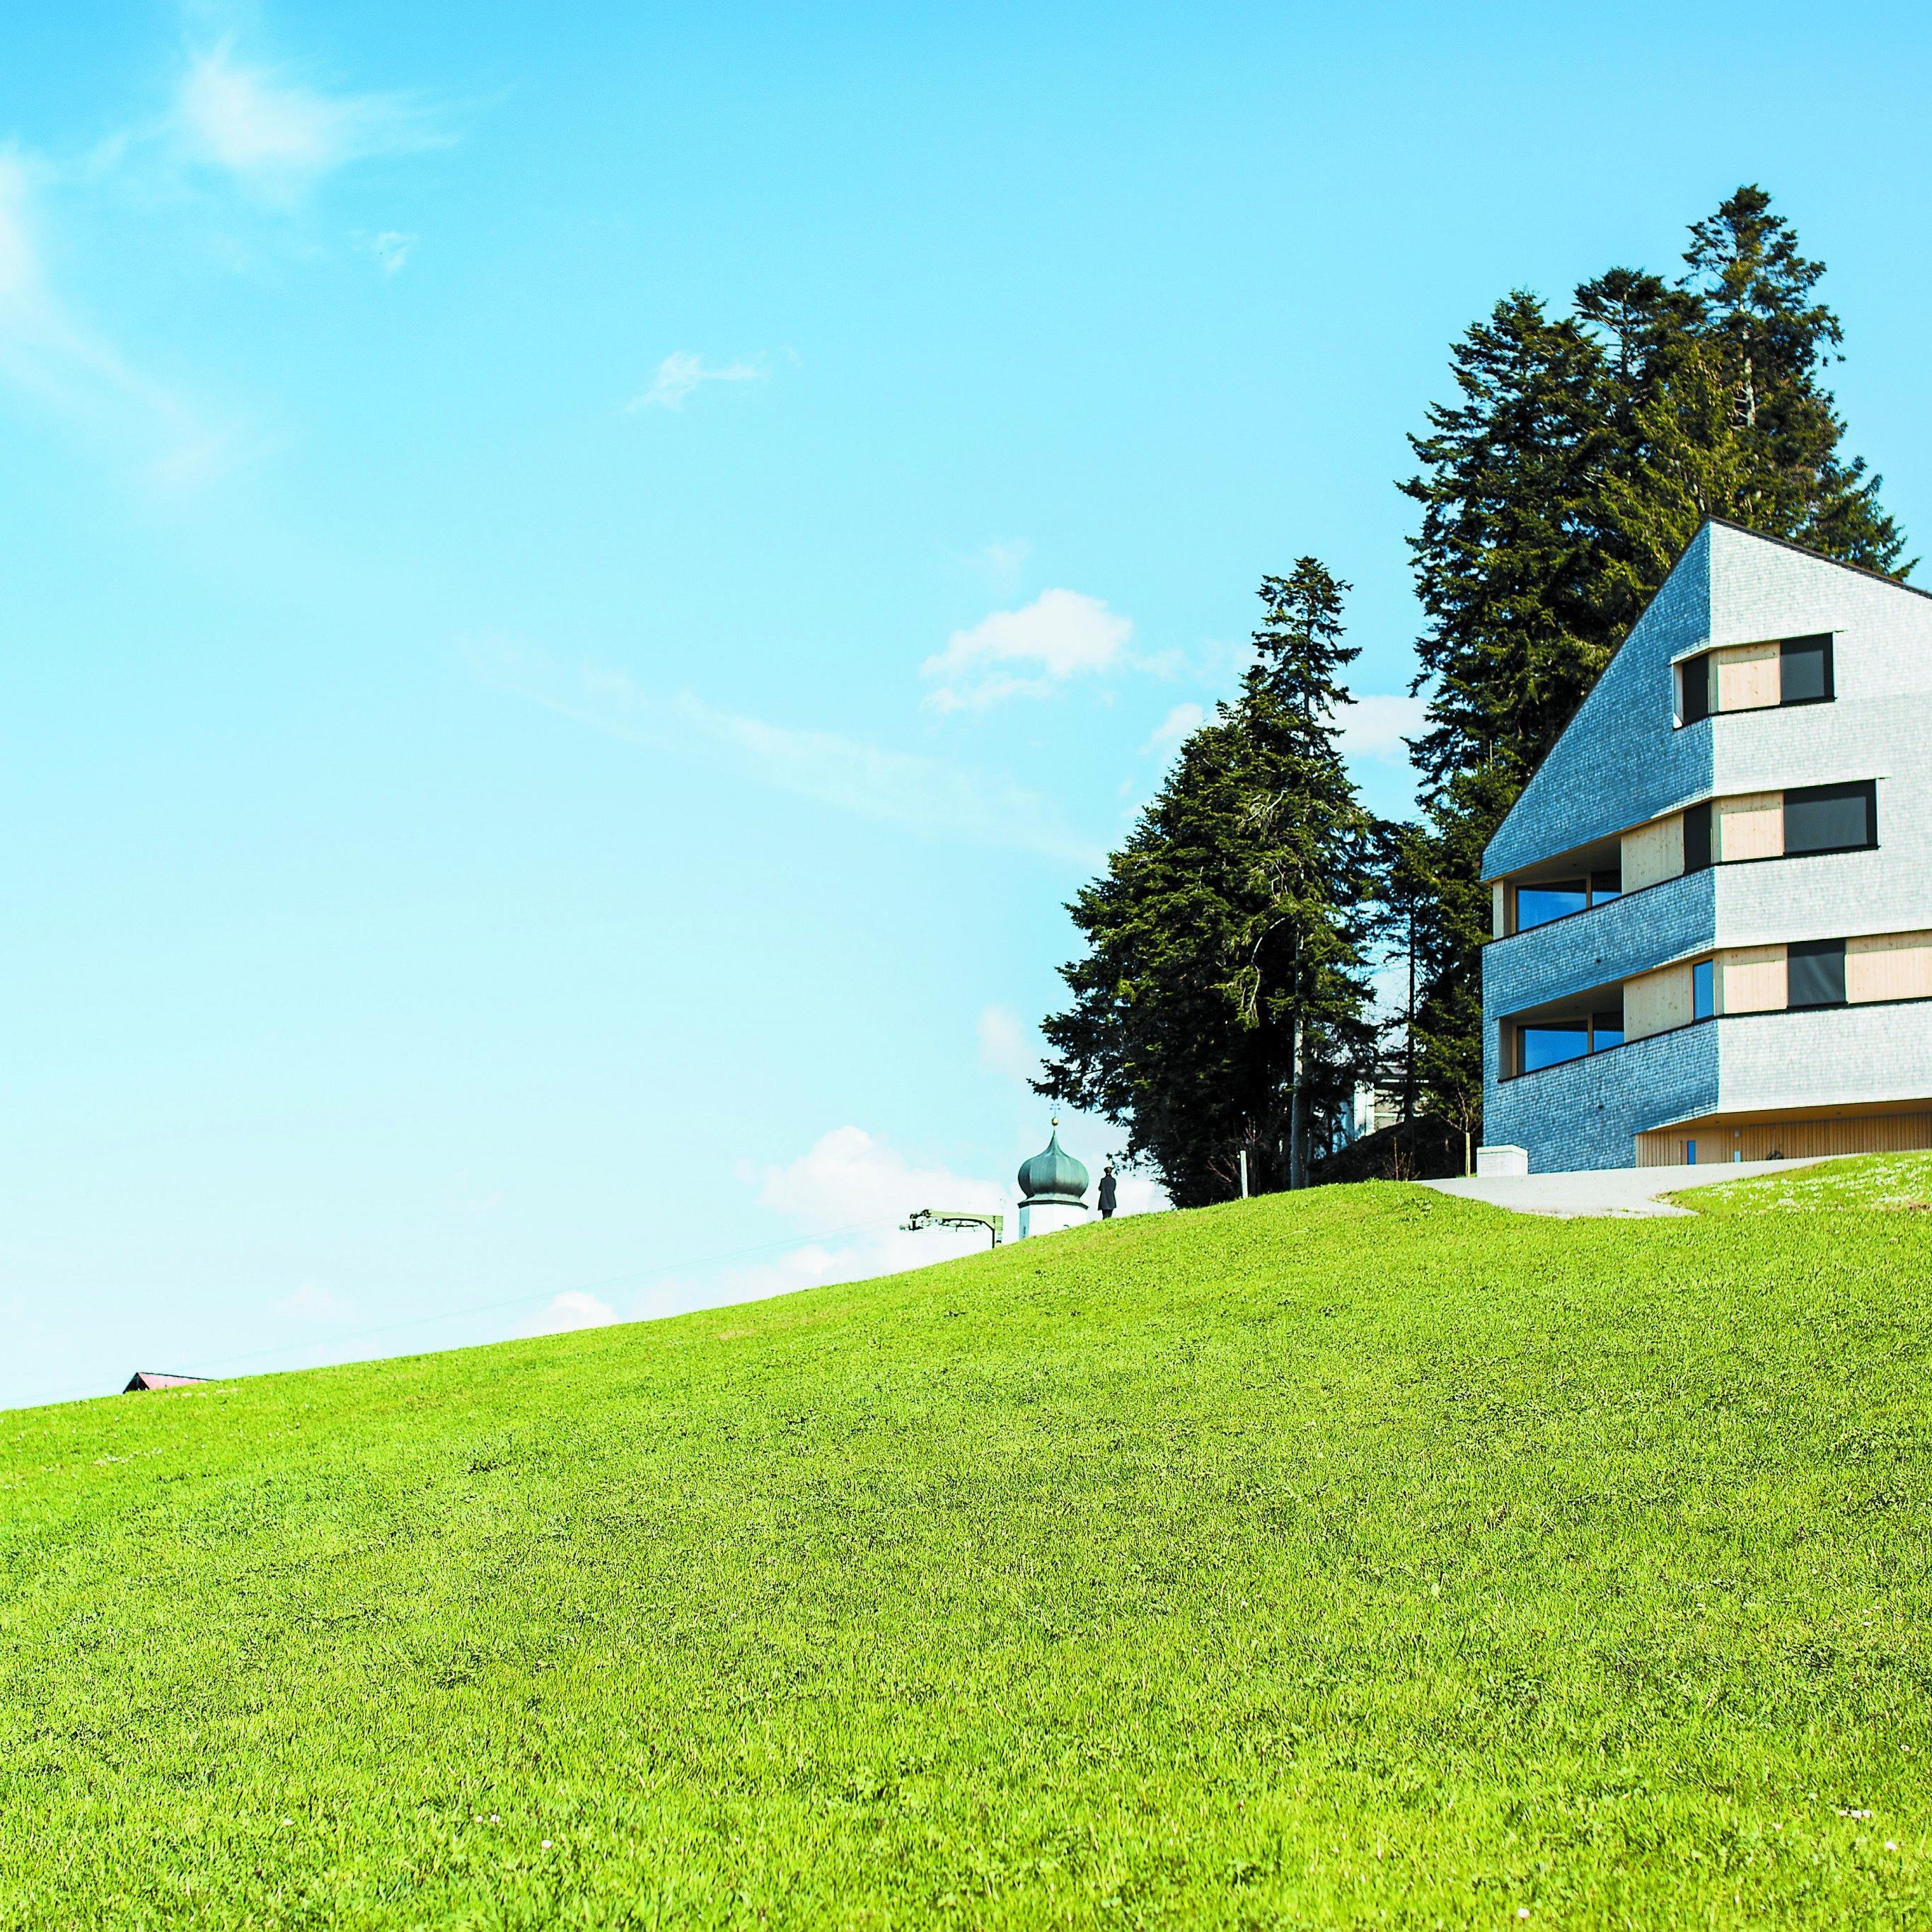 Architekt Juri Troy feilte lange am Baukörper dieses Hauses.